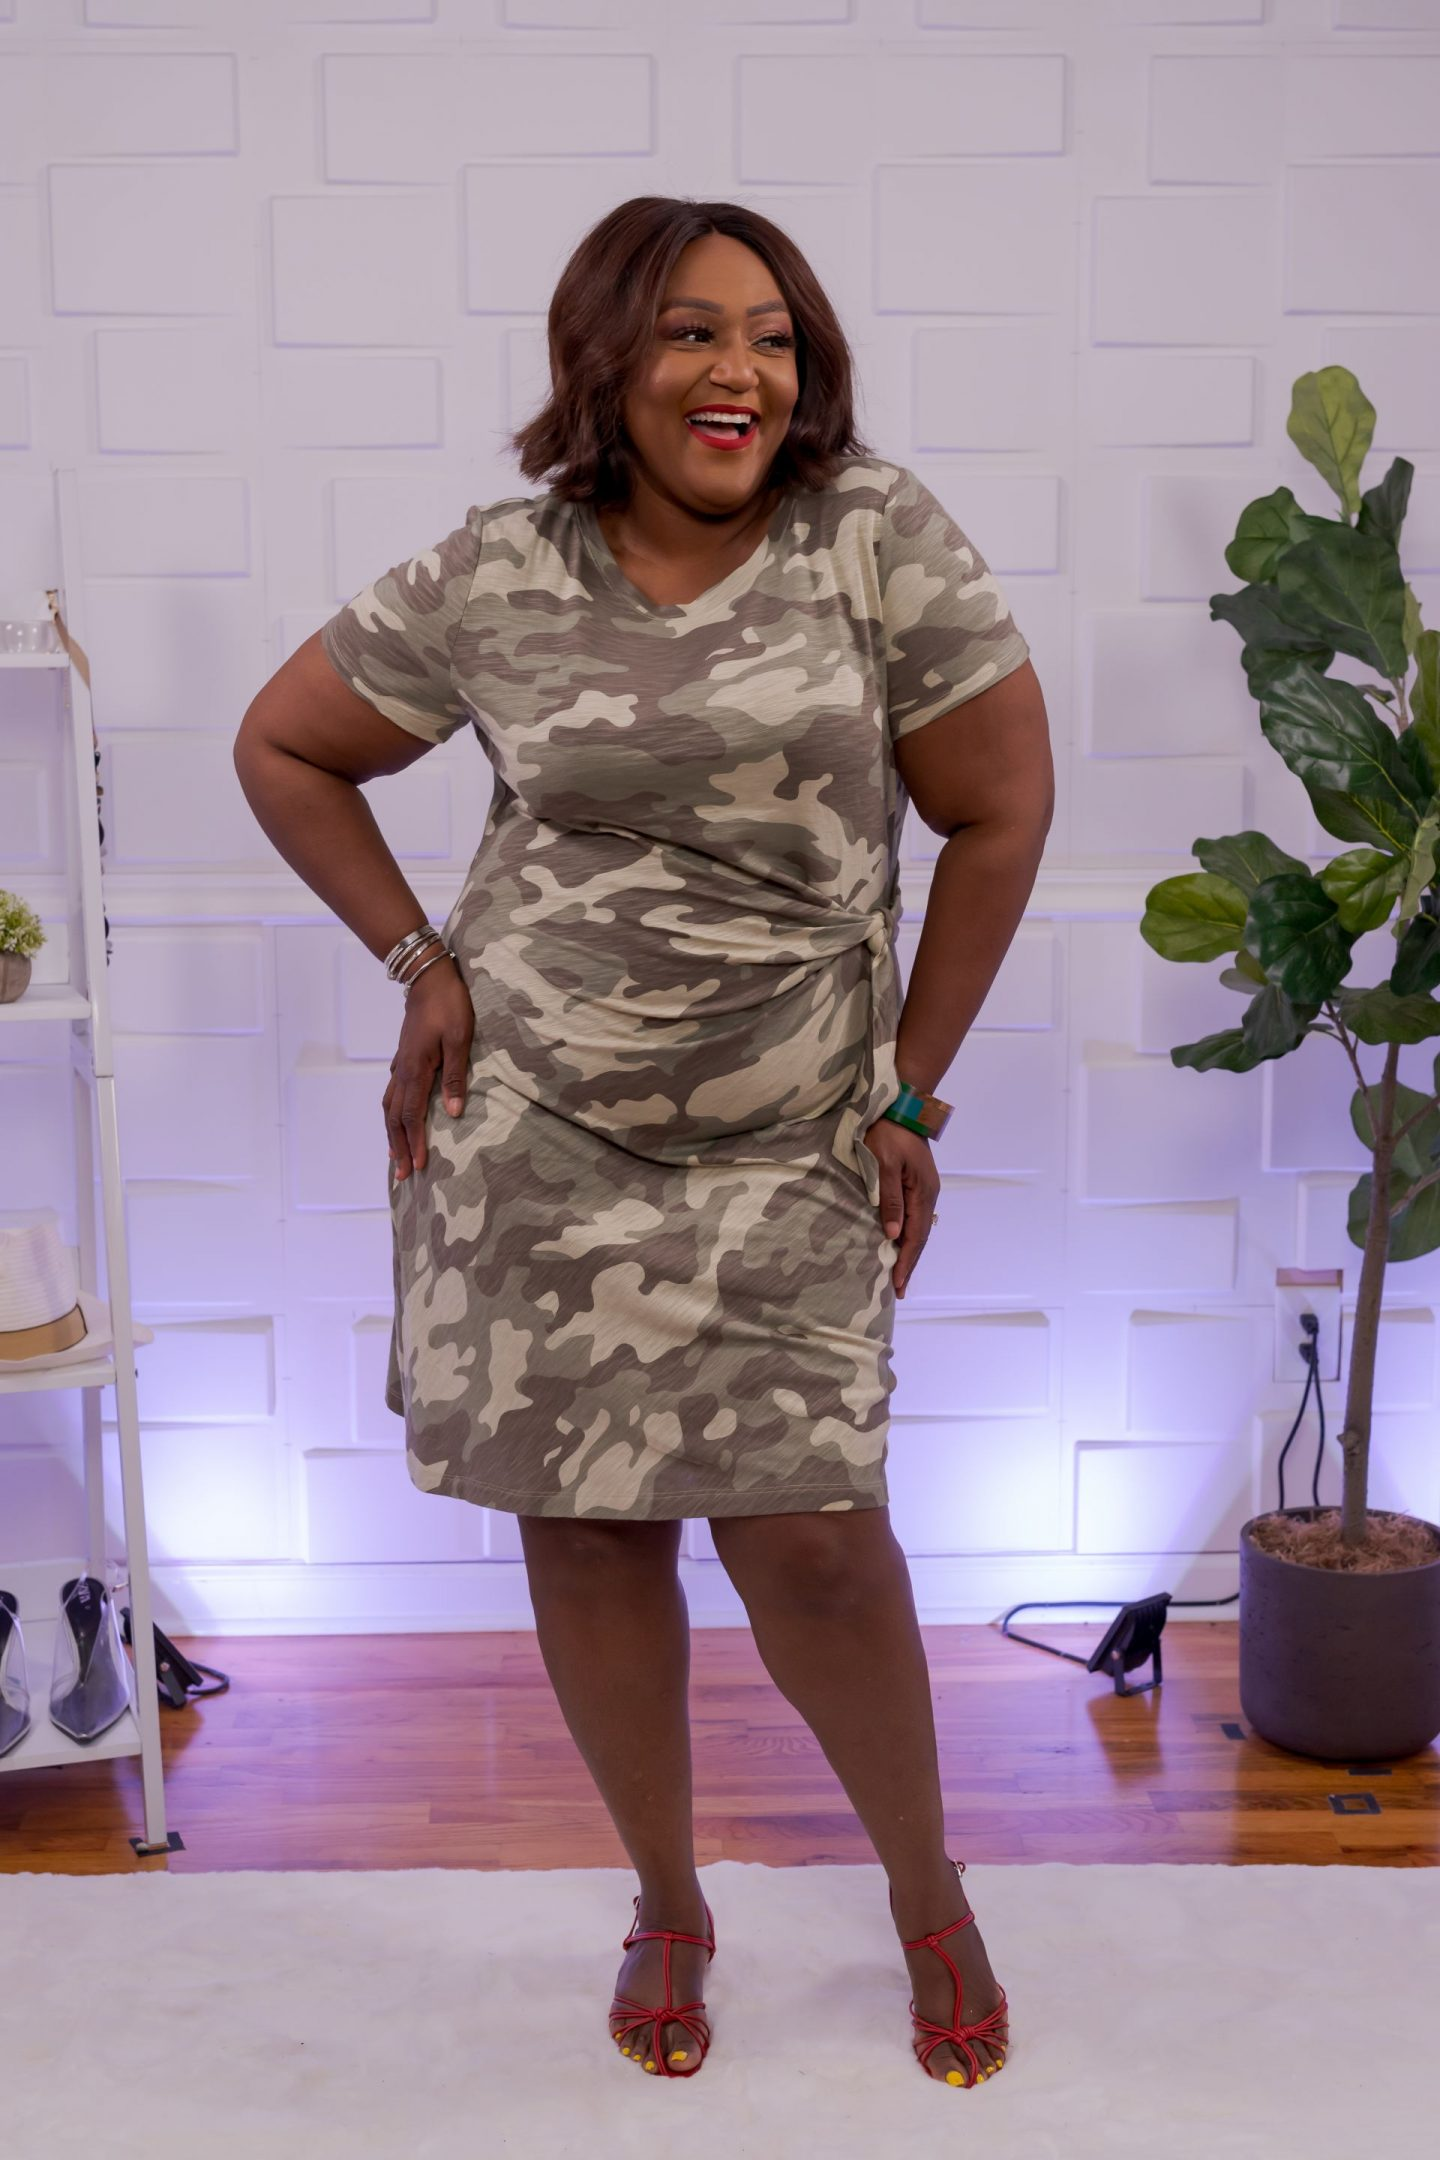 Nikki Free wearing a camouflage t-shirt dress